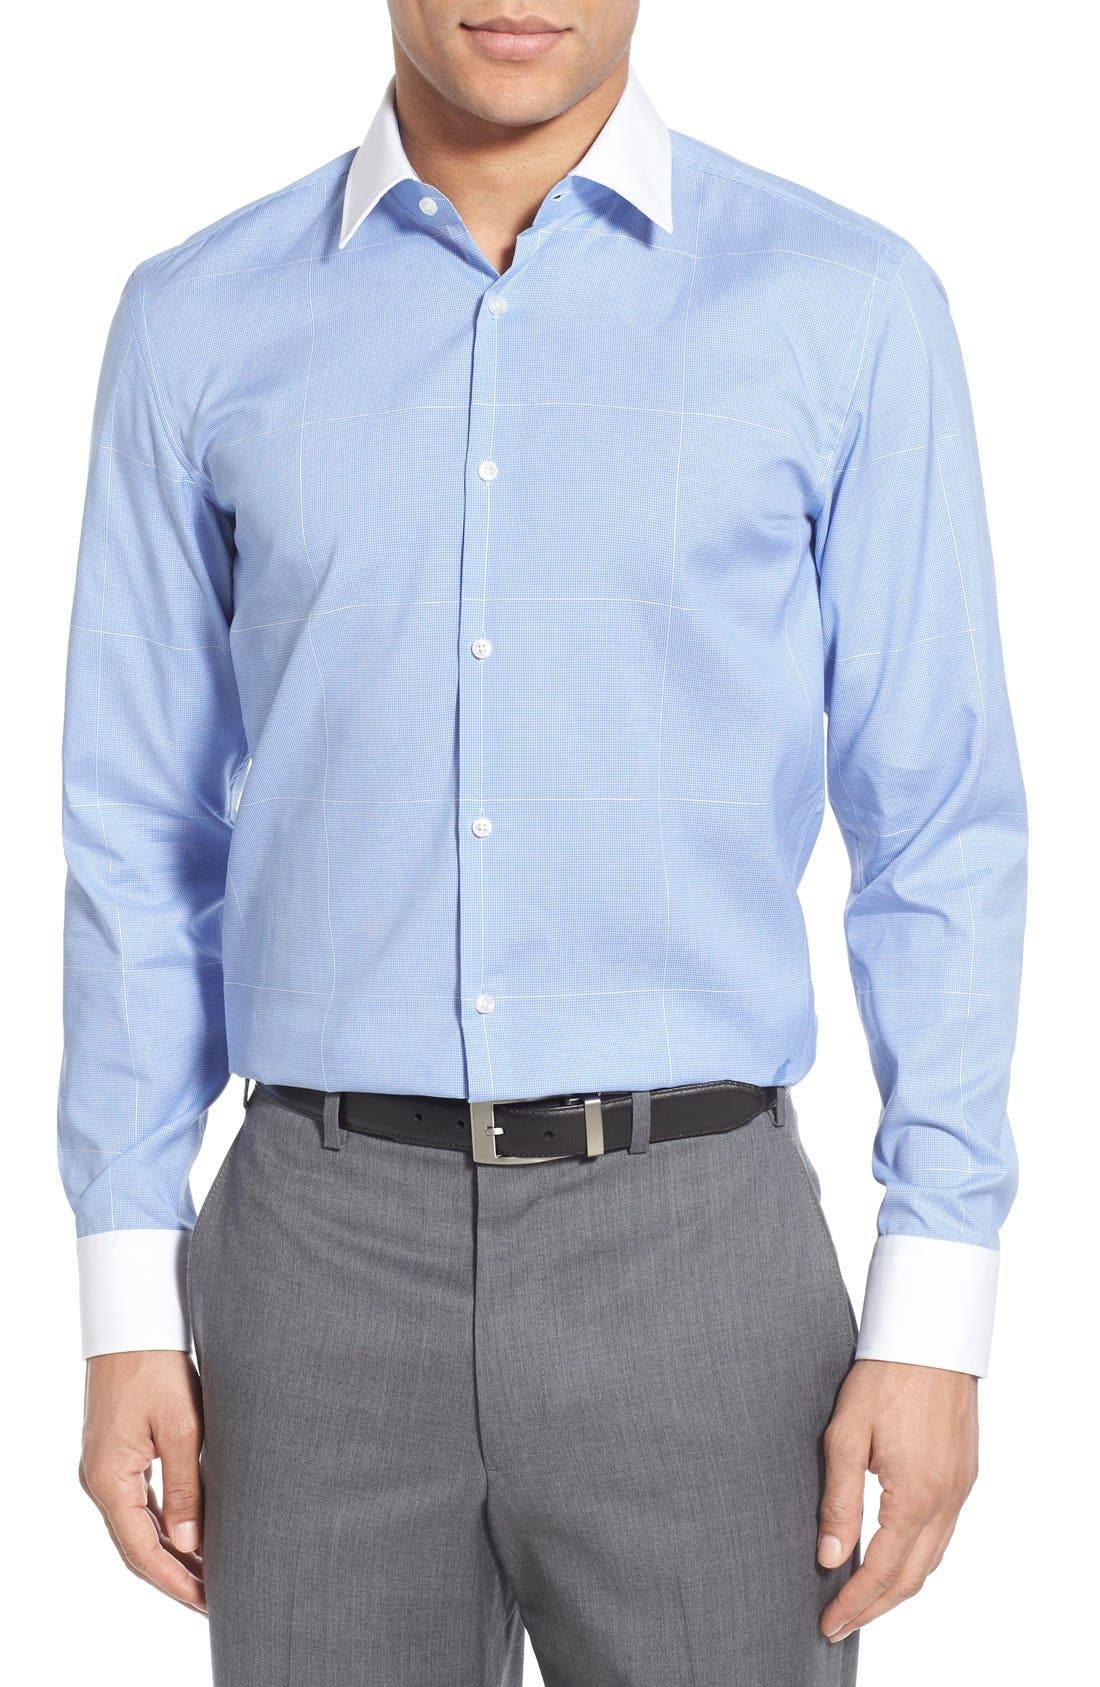 Alternate Image 2  - BOSS WW Slim Fit Easy Iron Check Dress Shirt